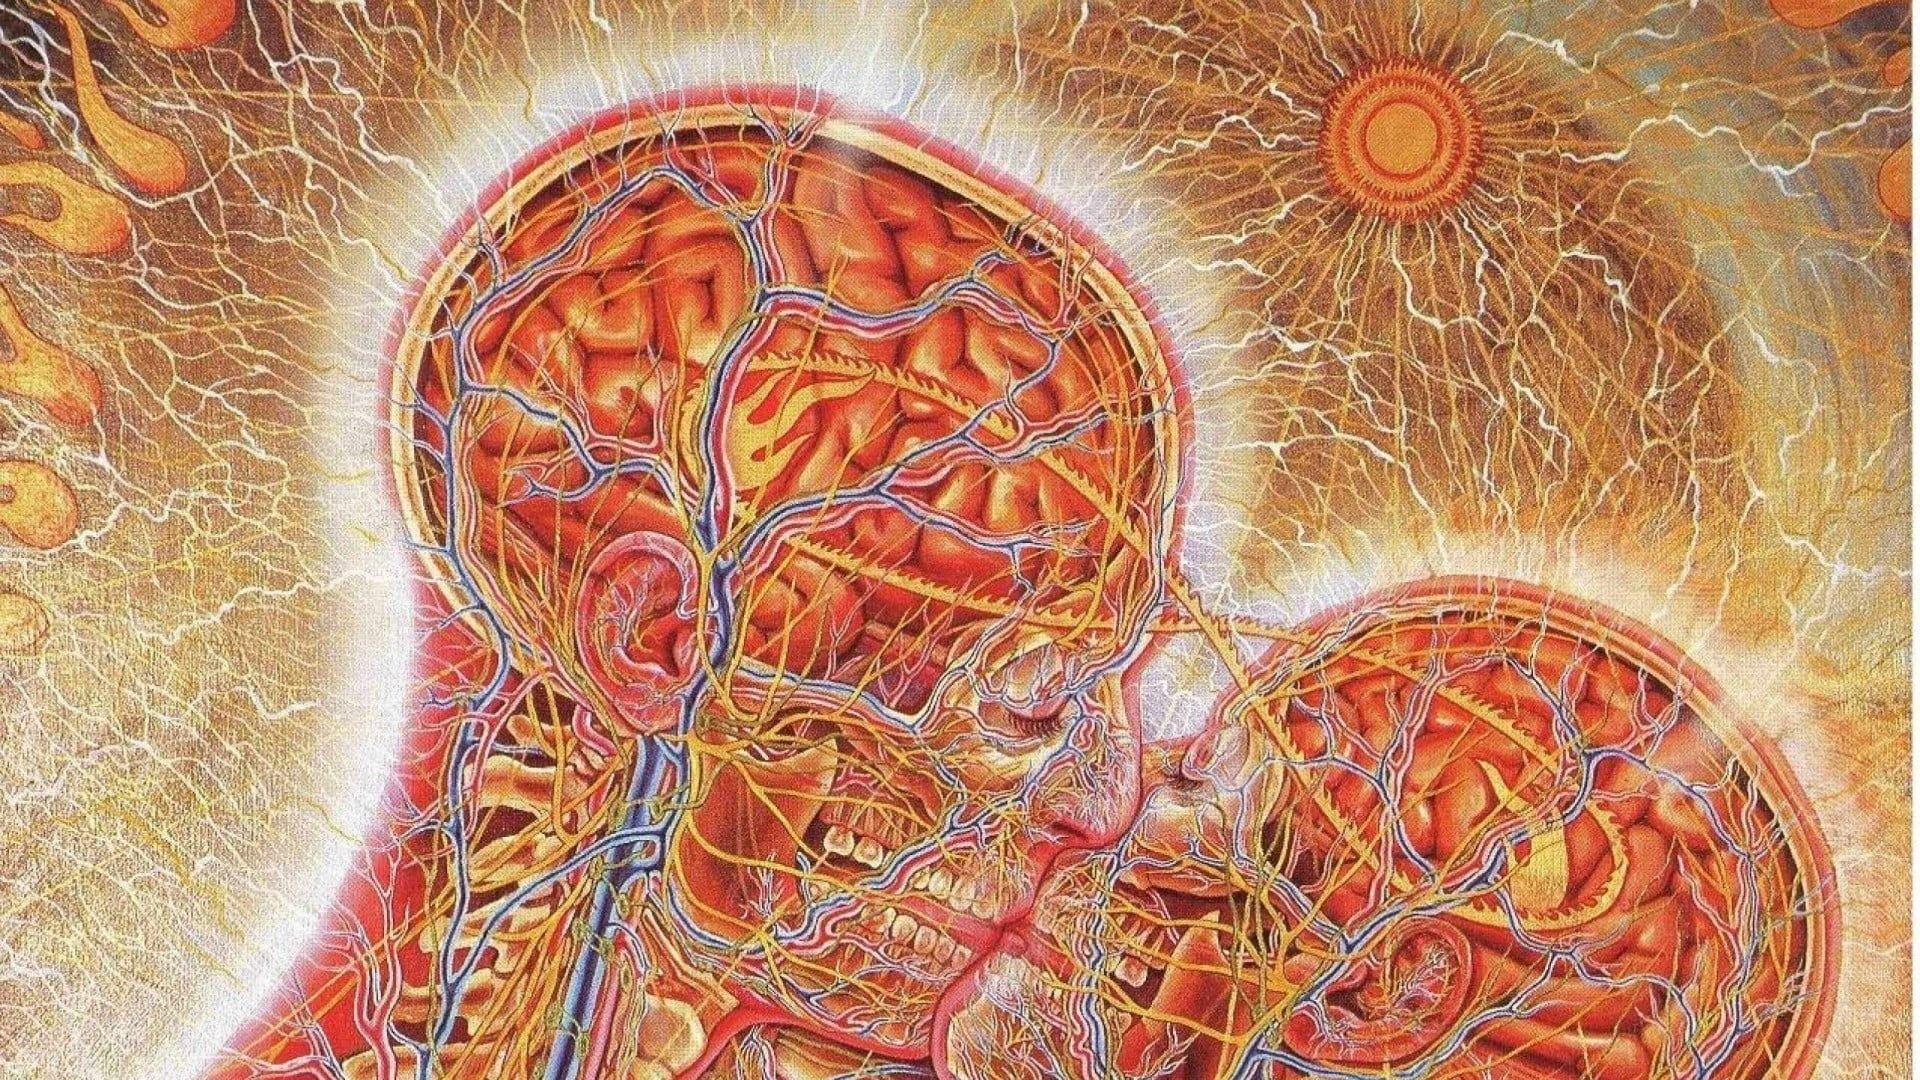 Human Anatomy Wallpapers - Wallpaper Cave